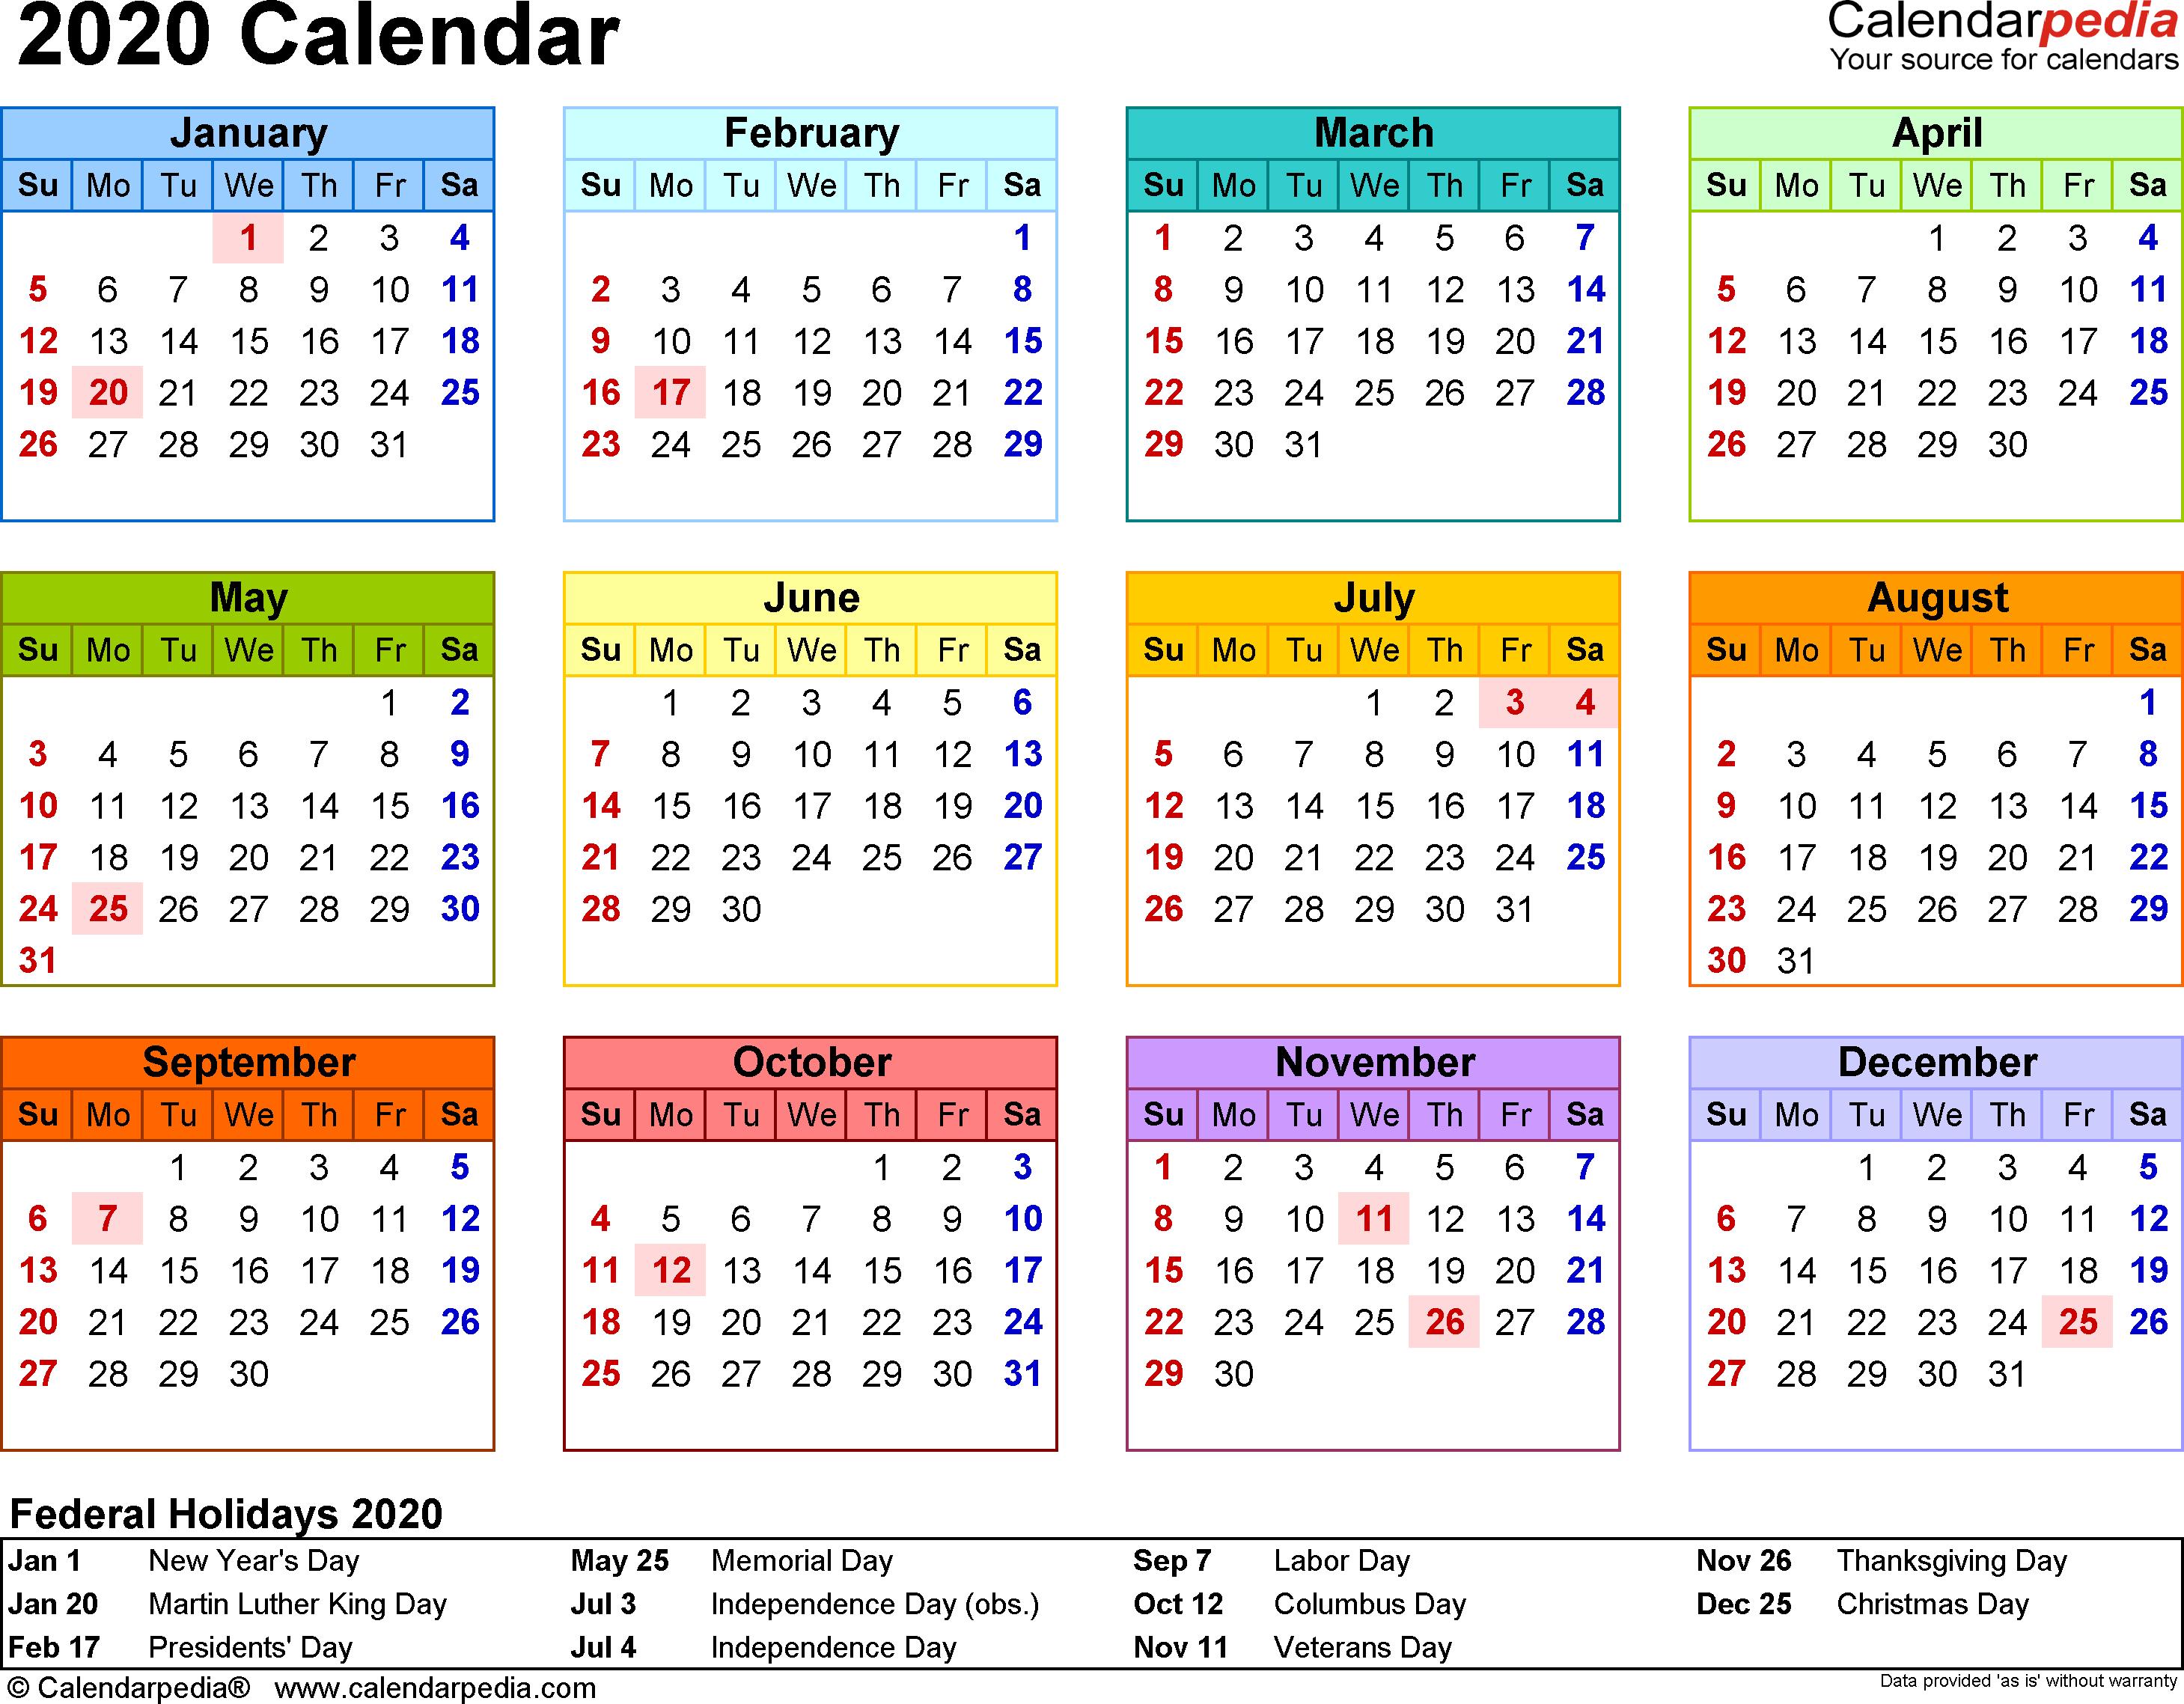 2020 Calendar - Download 18 Free Printable Excel Templates